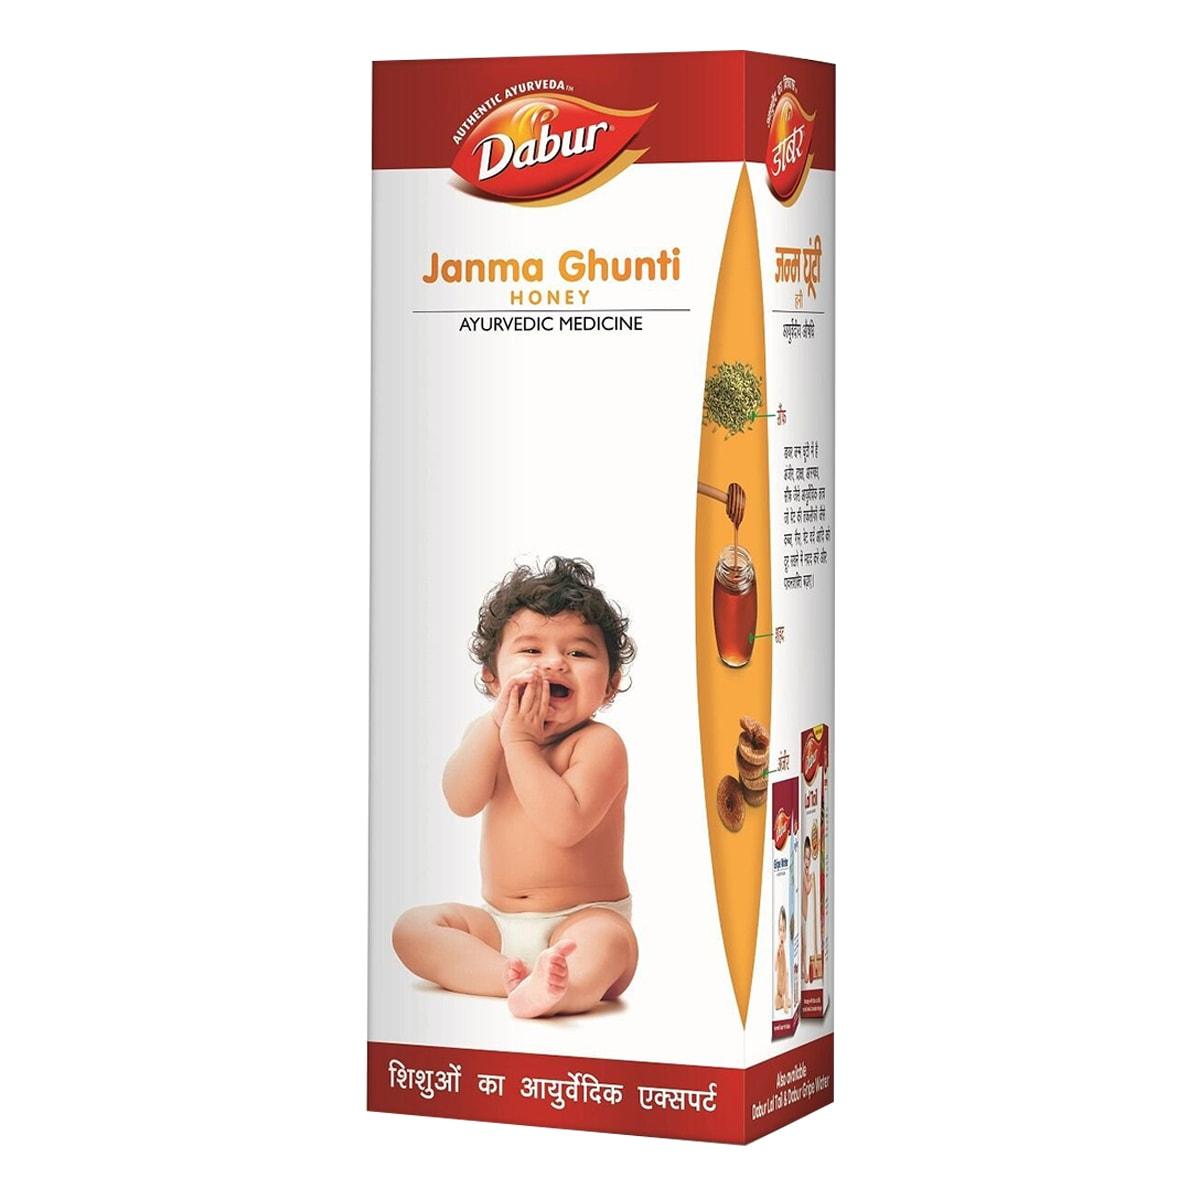 Buy Dabur Janma Ghunti Honey for Kids (Ayurvedic Medicine) - 60 ml